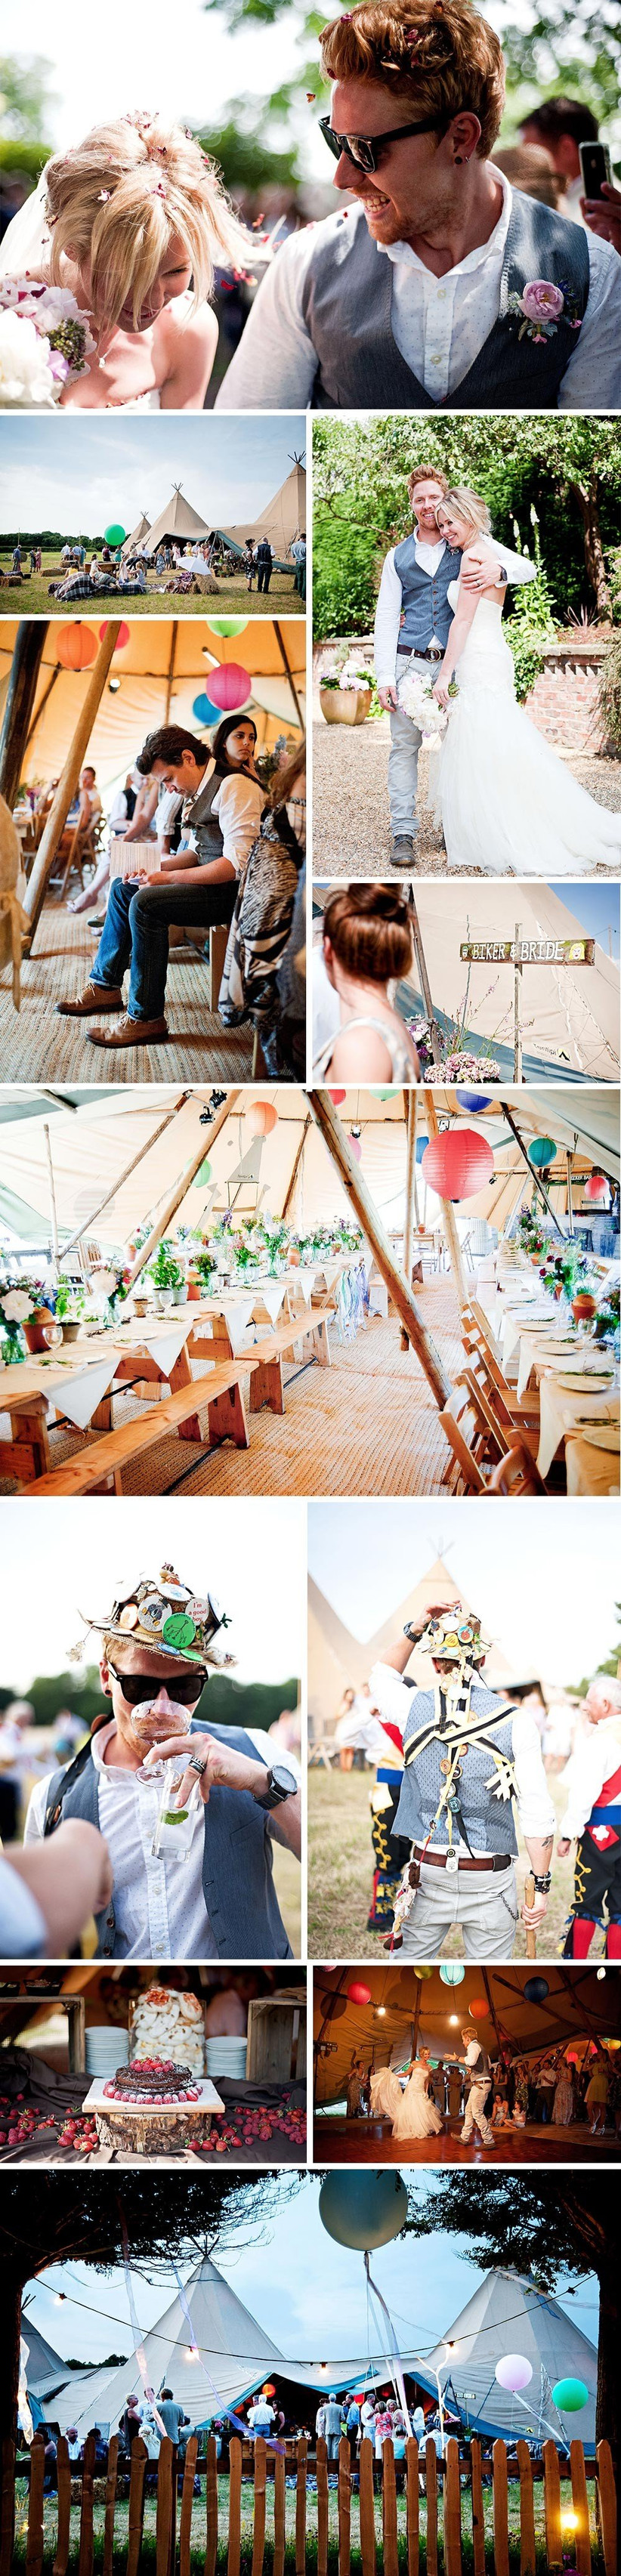 wedding-with-a-festival-theme